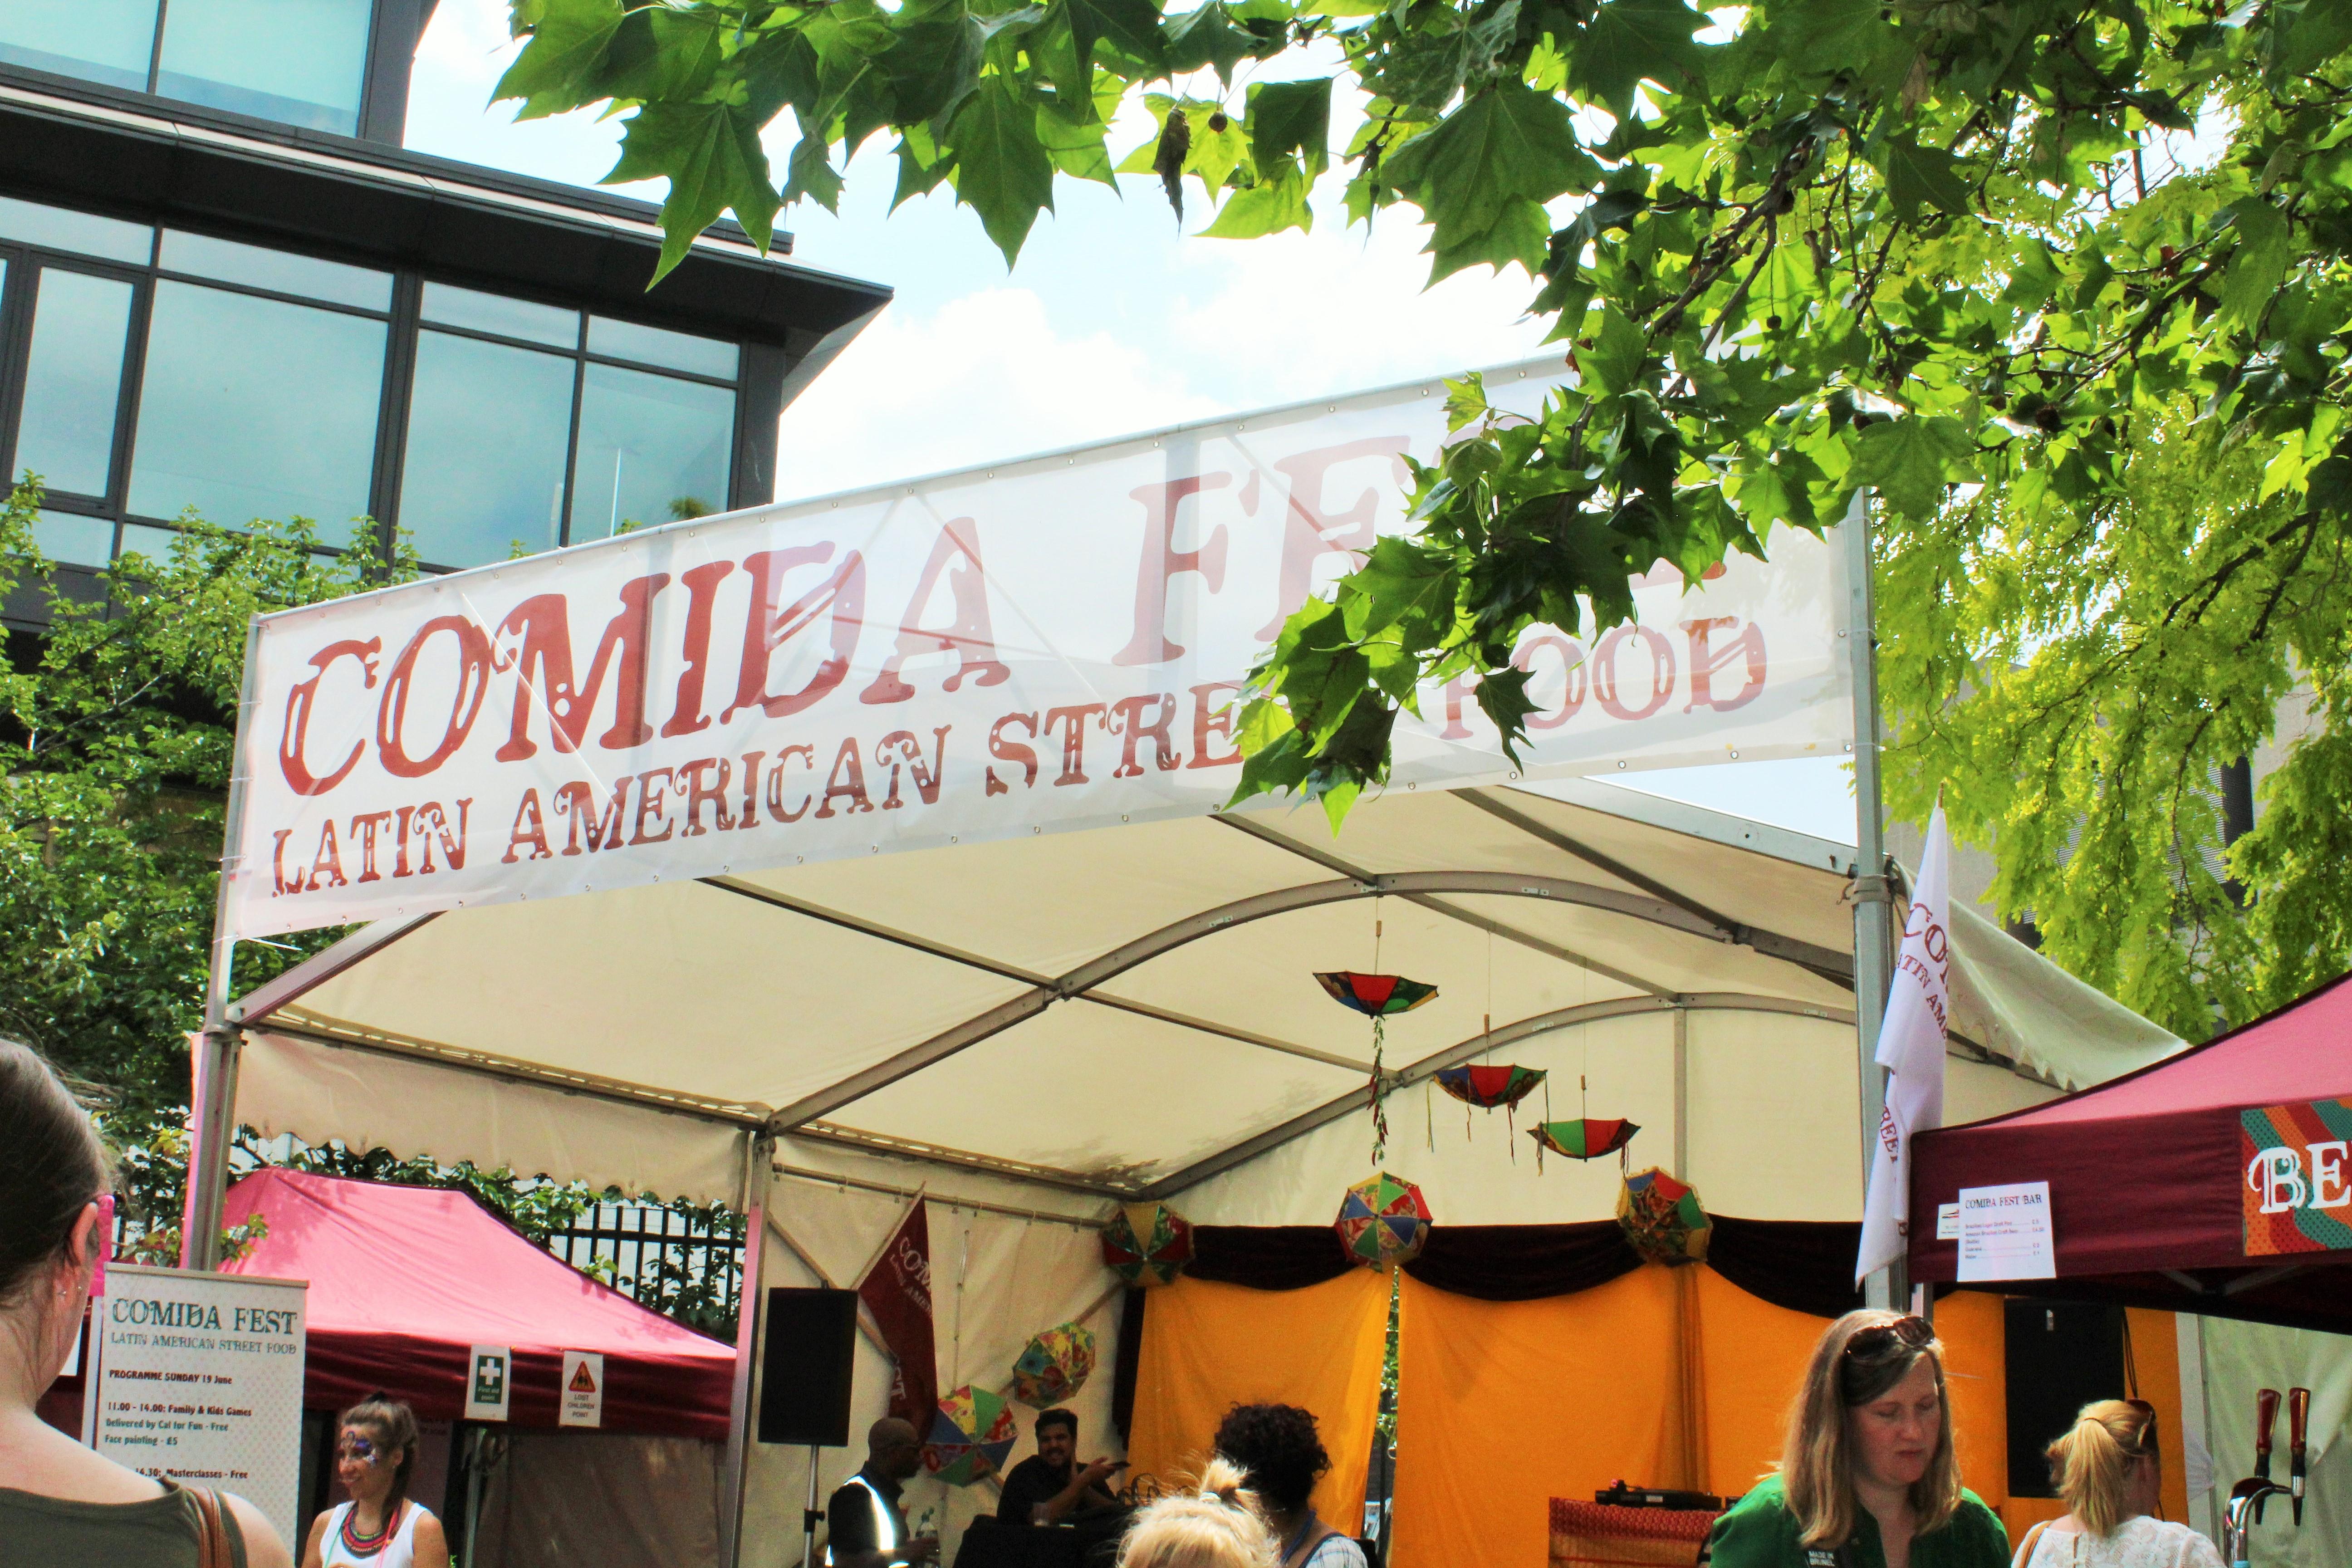 Comida Festival